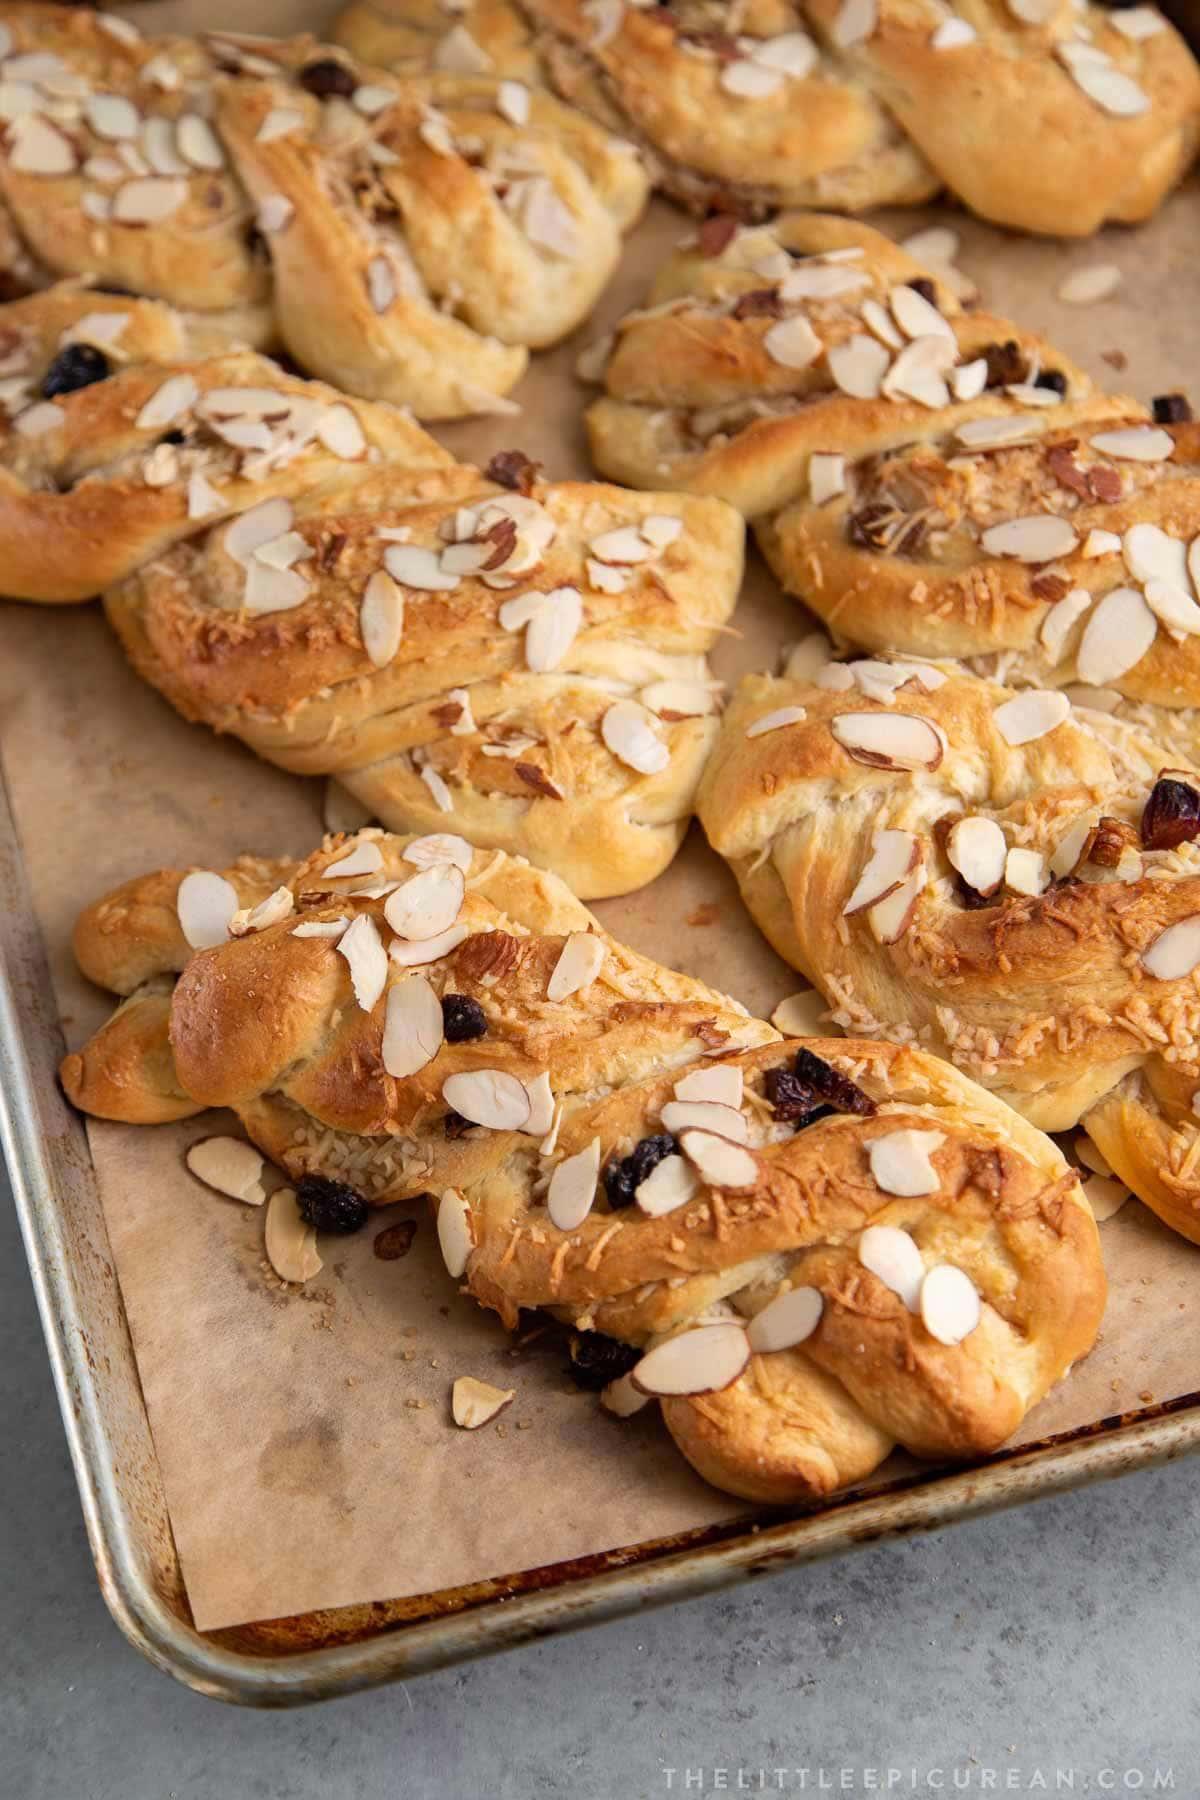 Braided Coconut Buns with raisins and cinnamon